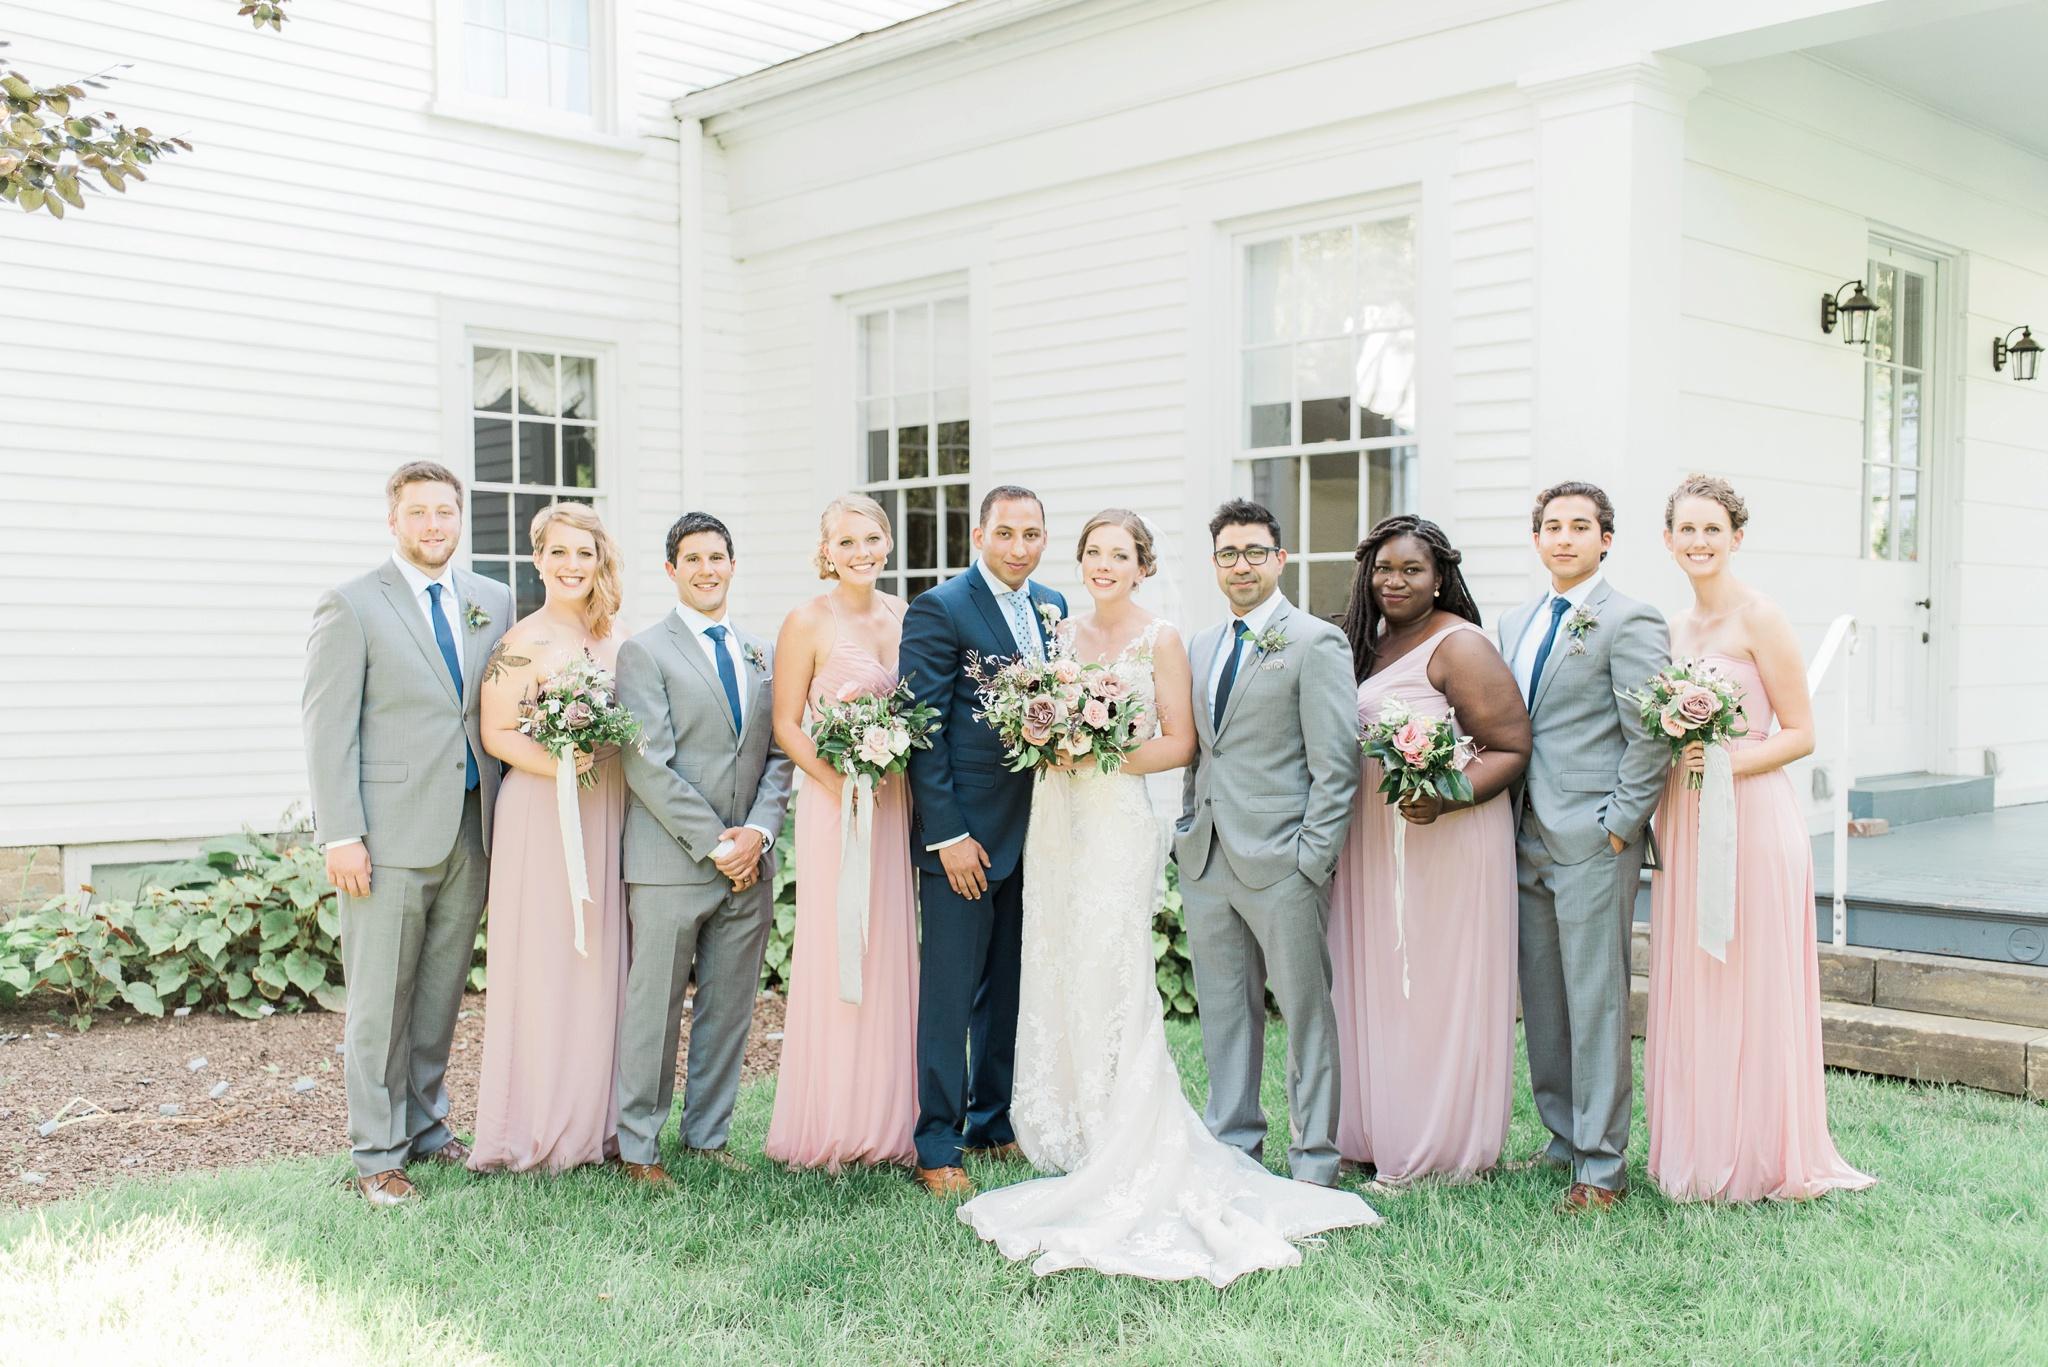 granville-inn-wedding-columbus-ohio-photographer_0058.jpg